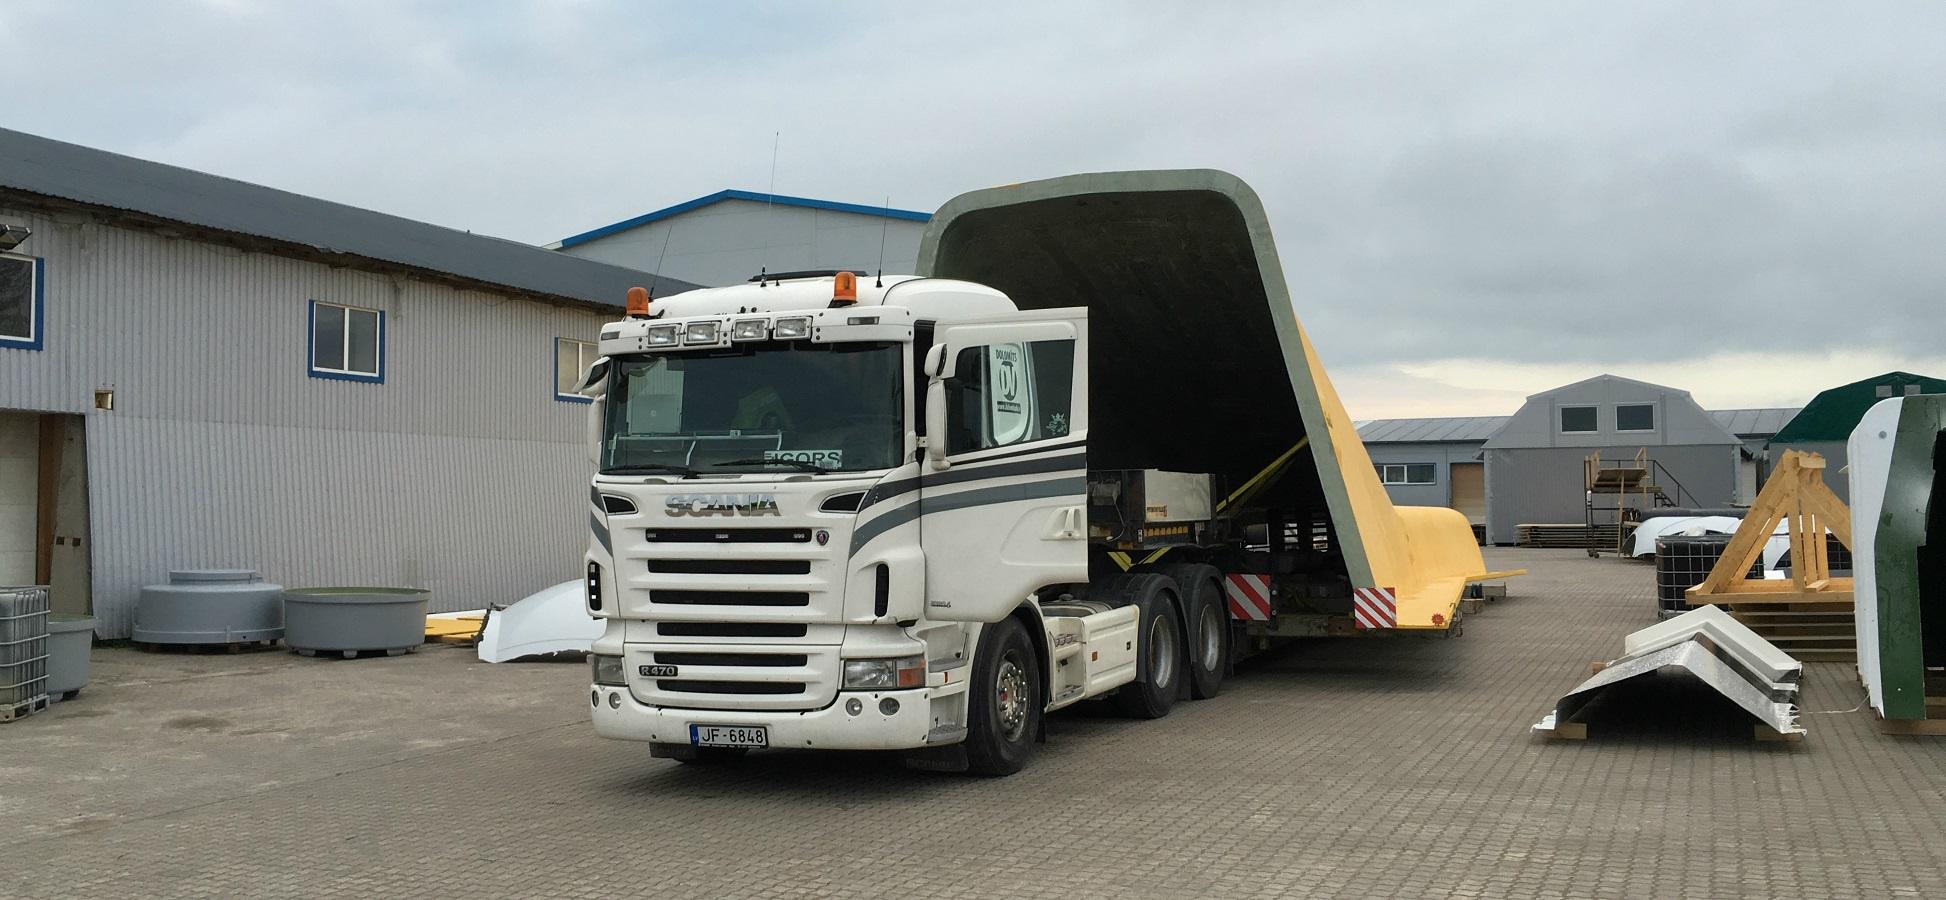 Notre dernier Projet Cargo: Construction de fibres de verre